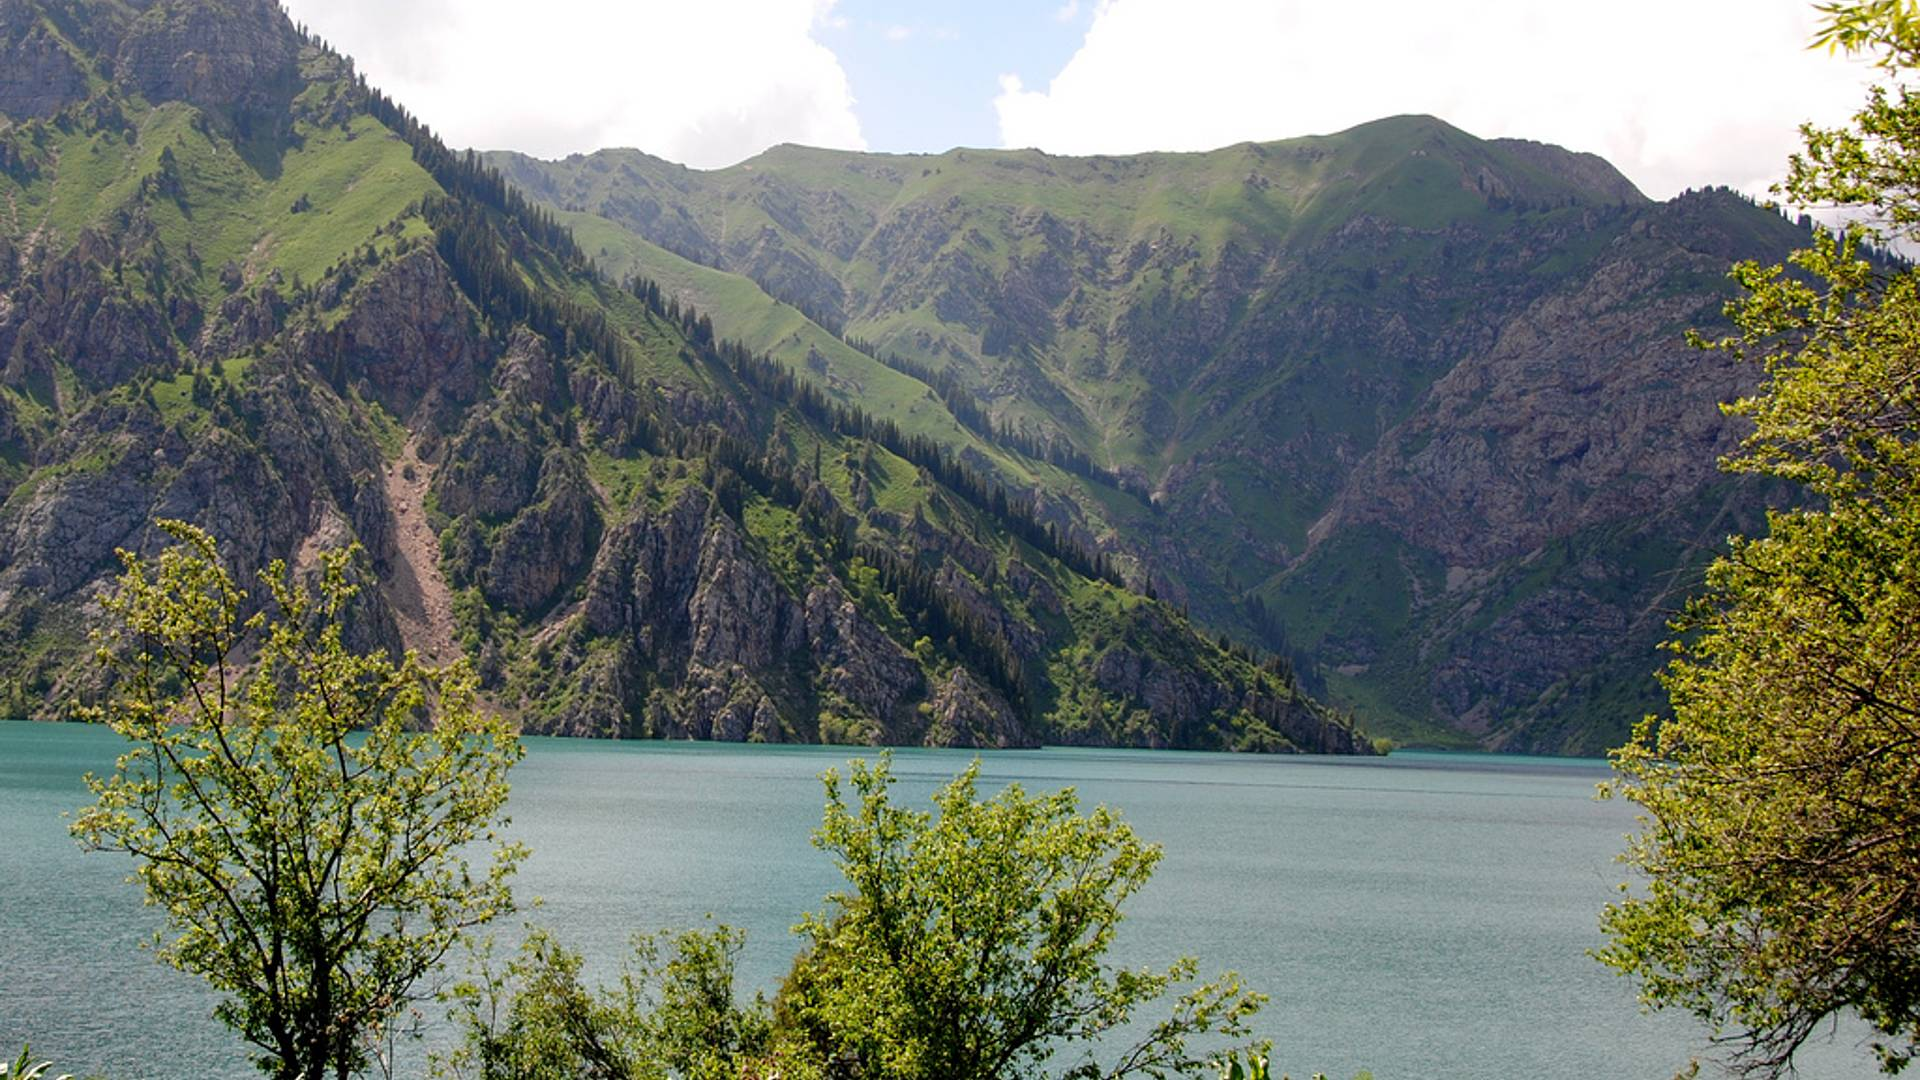 Pays incroyable: culture, nature et population locale